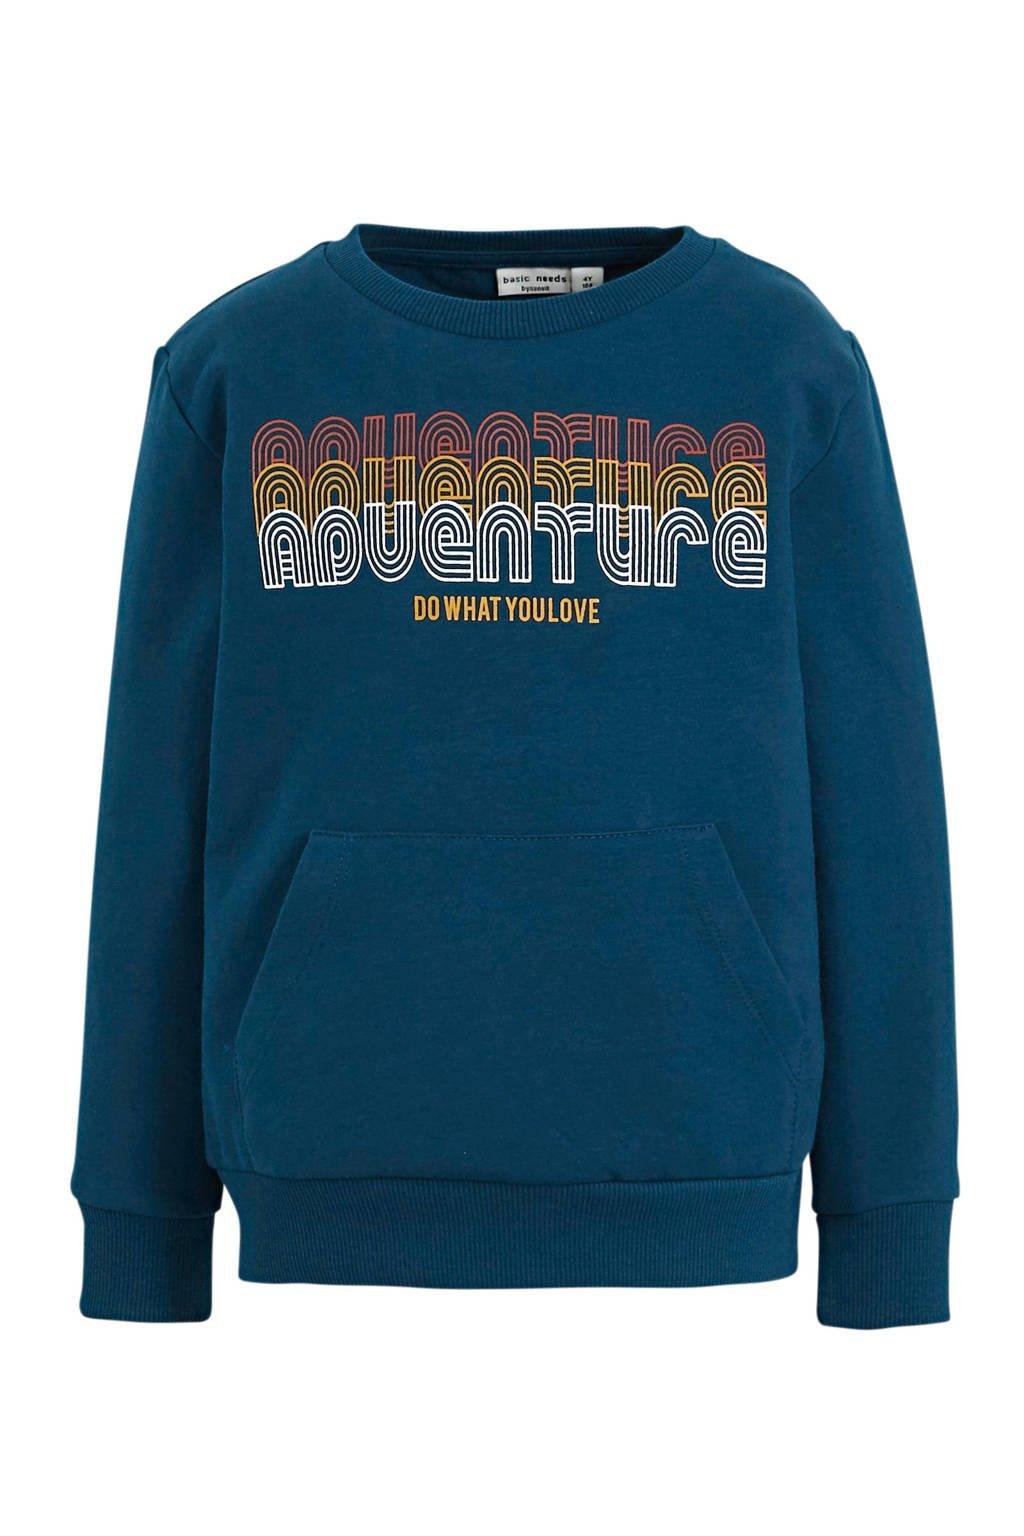 NAME IT MINI sweater Vugo met tekst blauw/wit/oranje, Blauw/wit/oranje